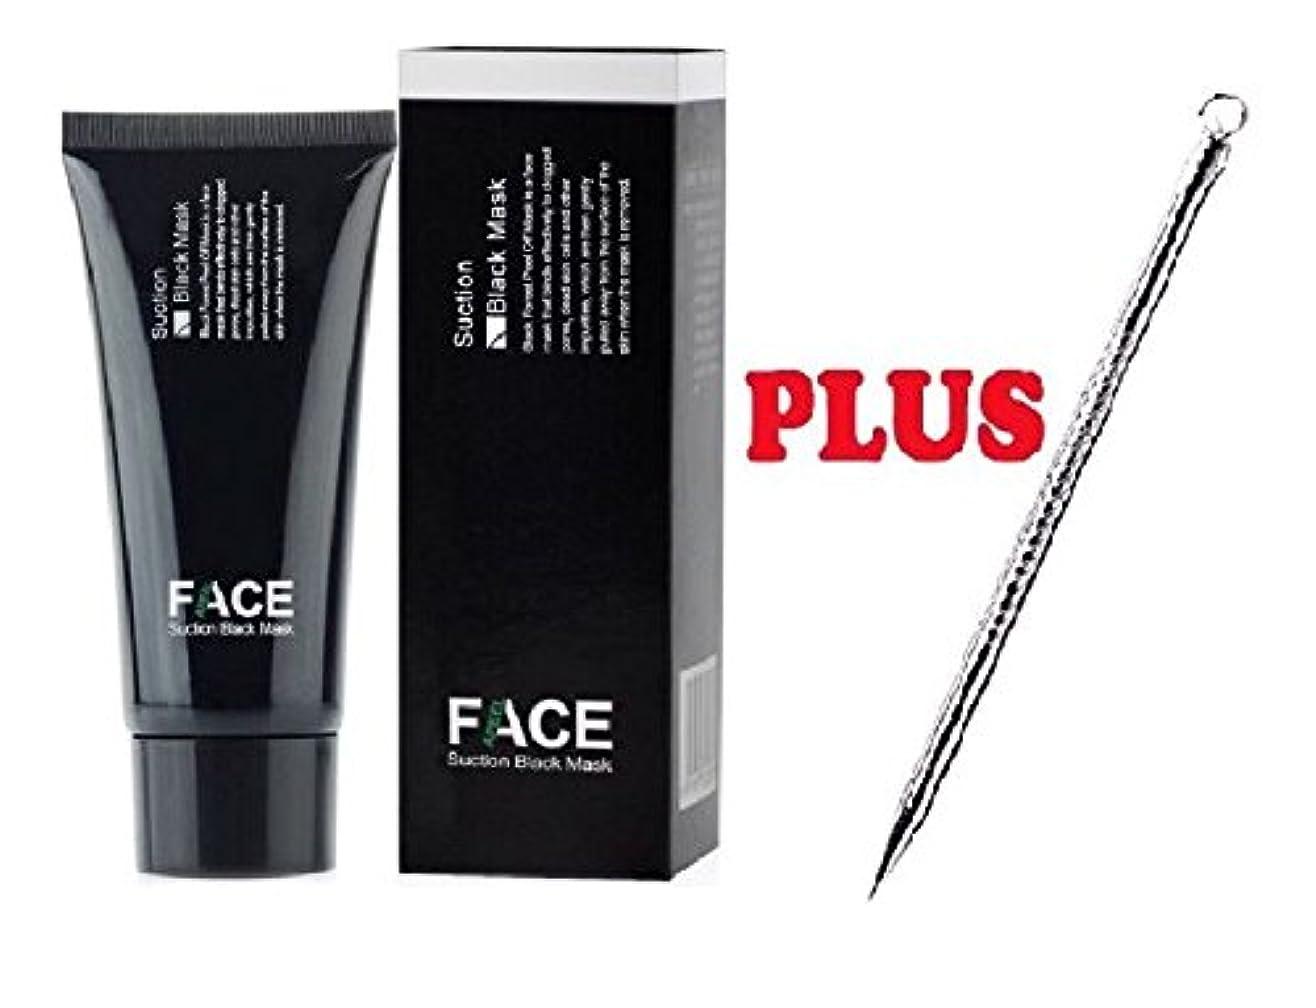 faceapeel blackhead acne remover facial mask 50 ml professional blackhead tool